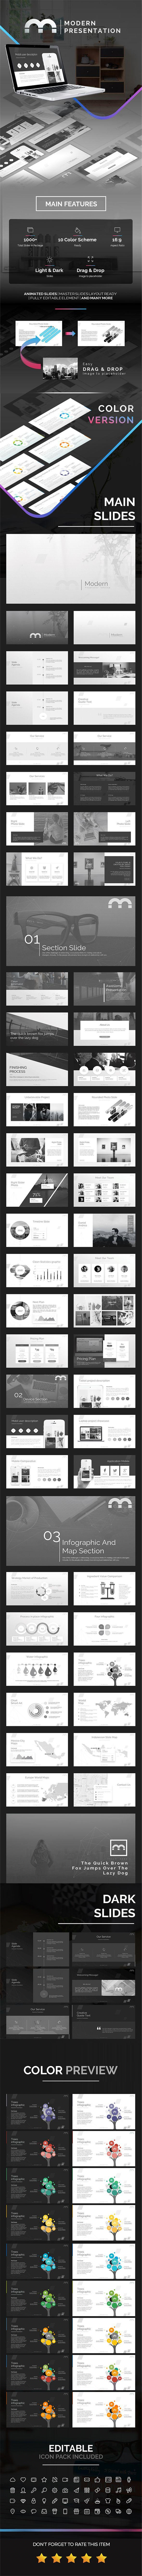 modern powerpoint template | download, powerpoint presentation, Presentation templates